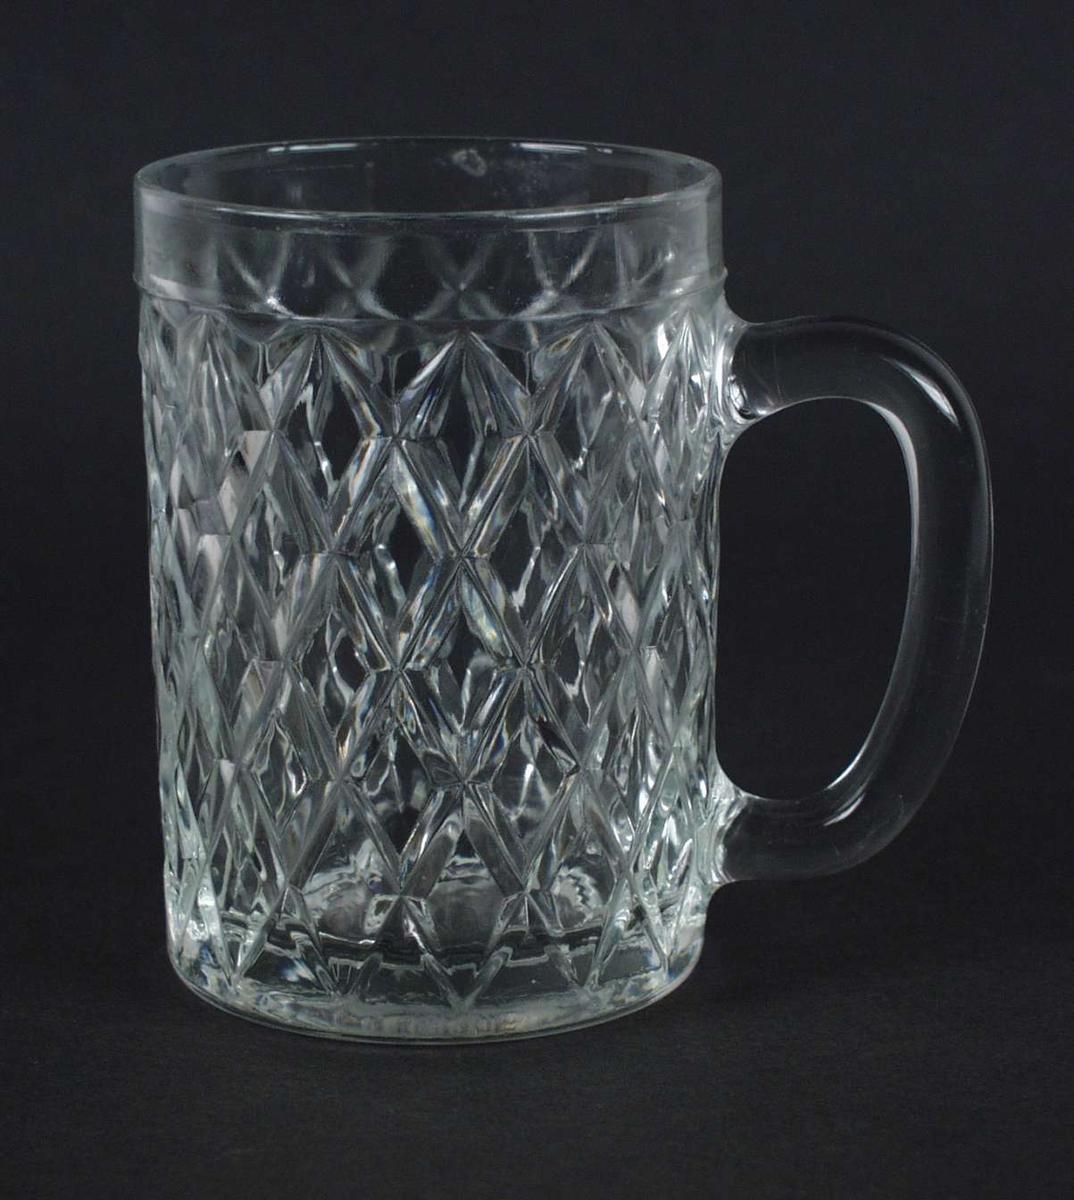 Seidel i pressglass med rutemønster.